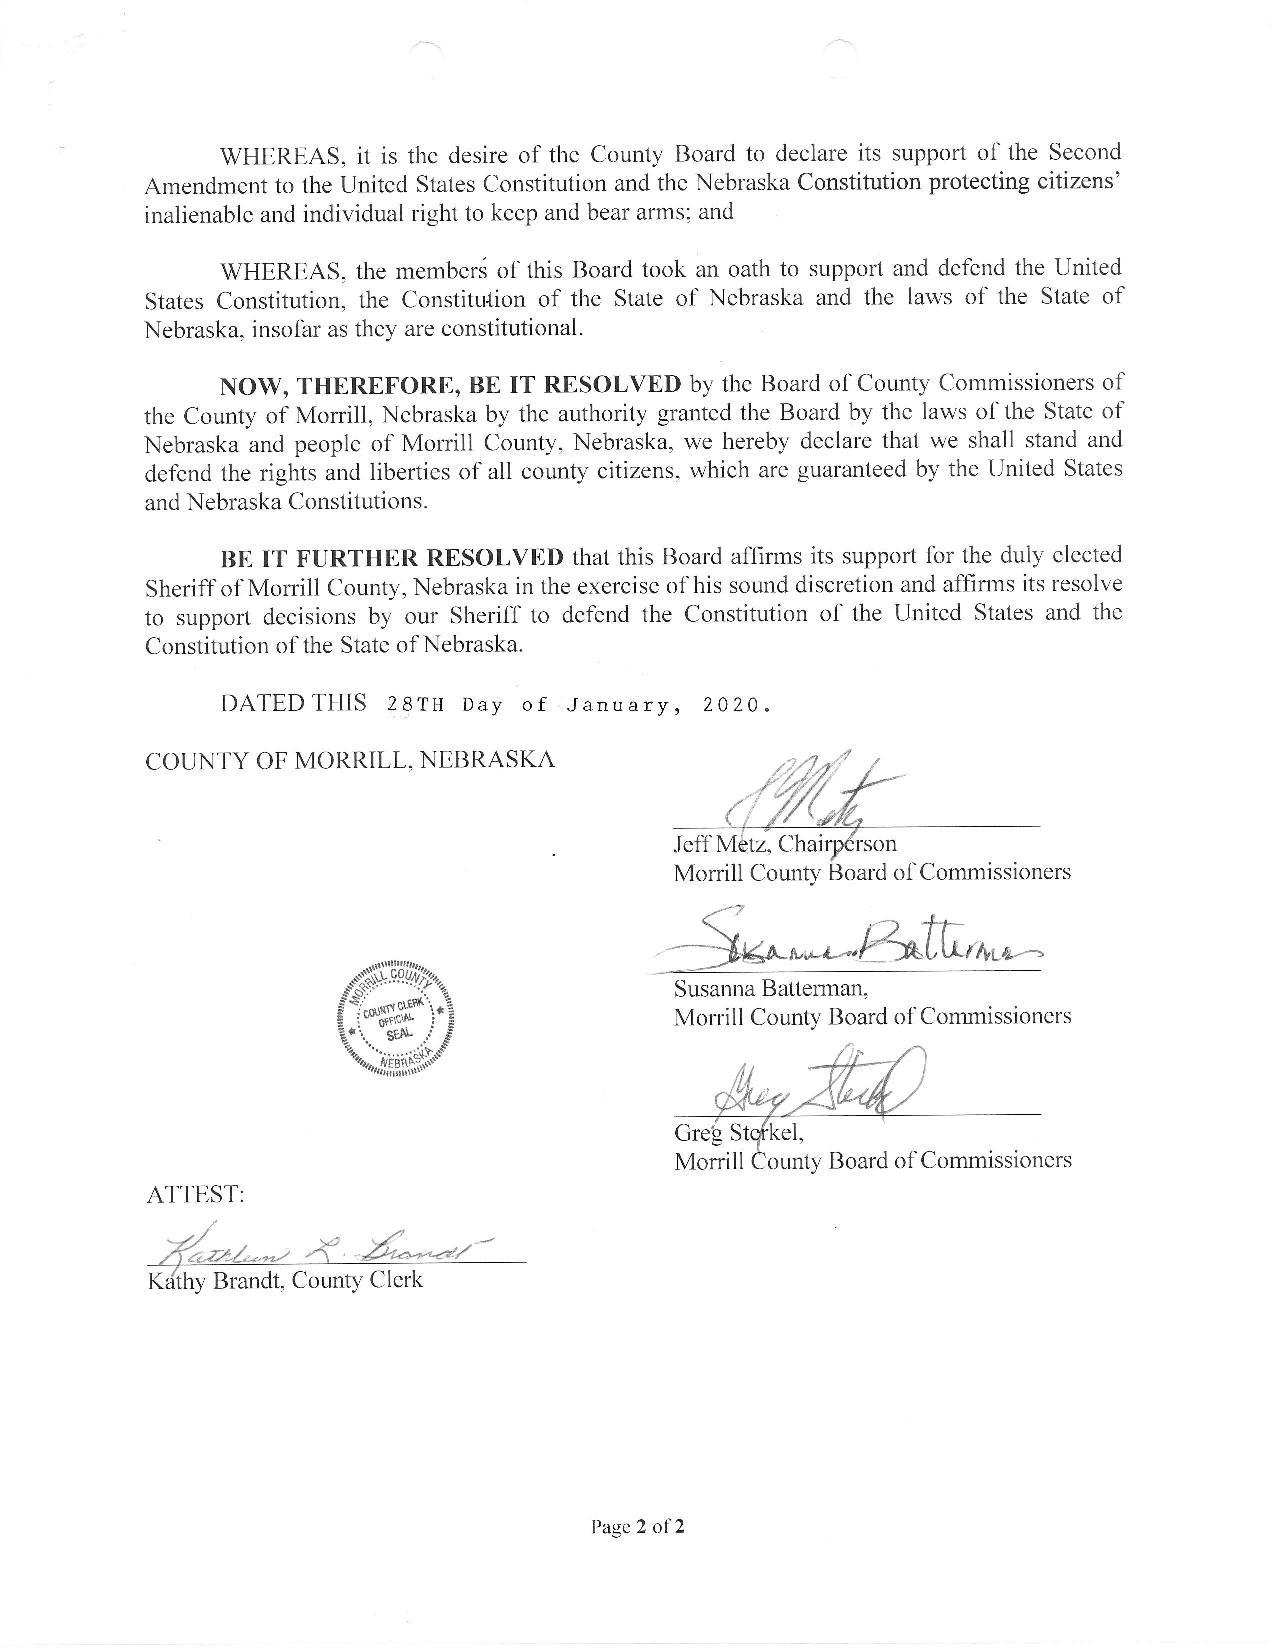 Morrill County Nebraska 2nd Amendment Resolution Page 2